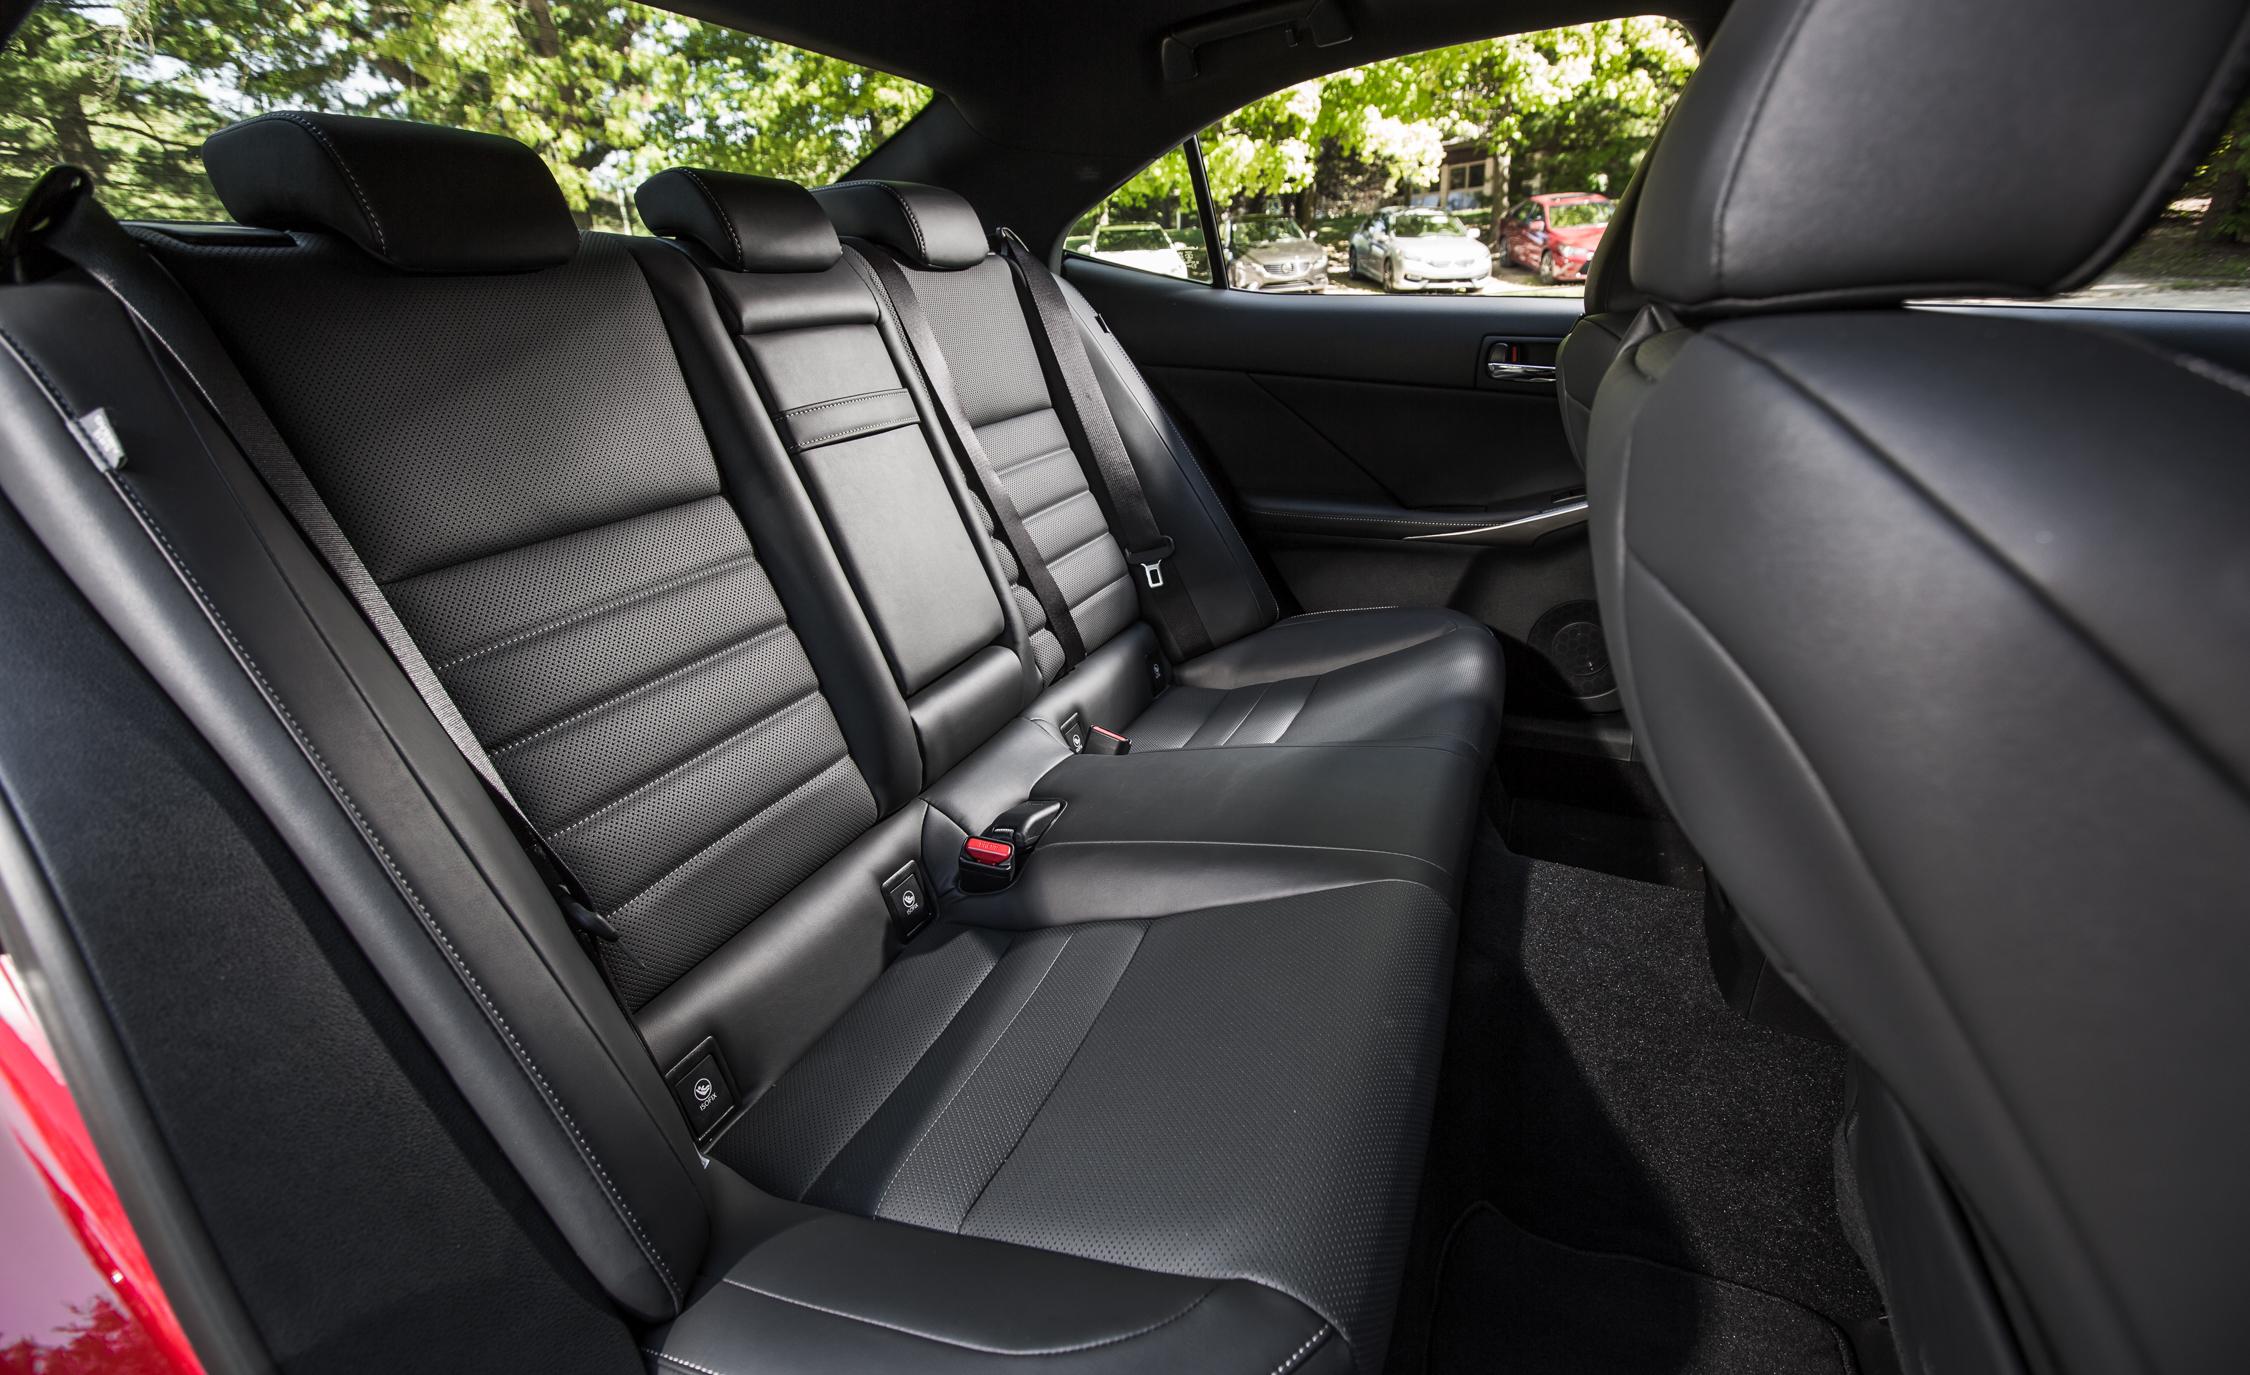 2016 Lexus IS200t F Sport Interior Seats Rear